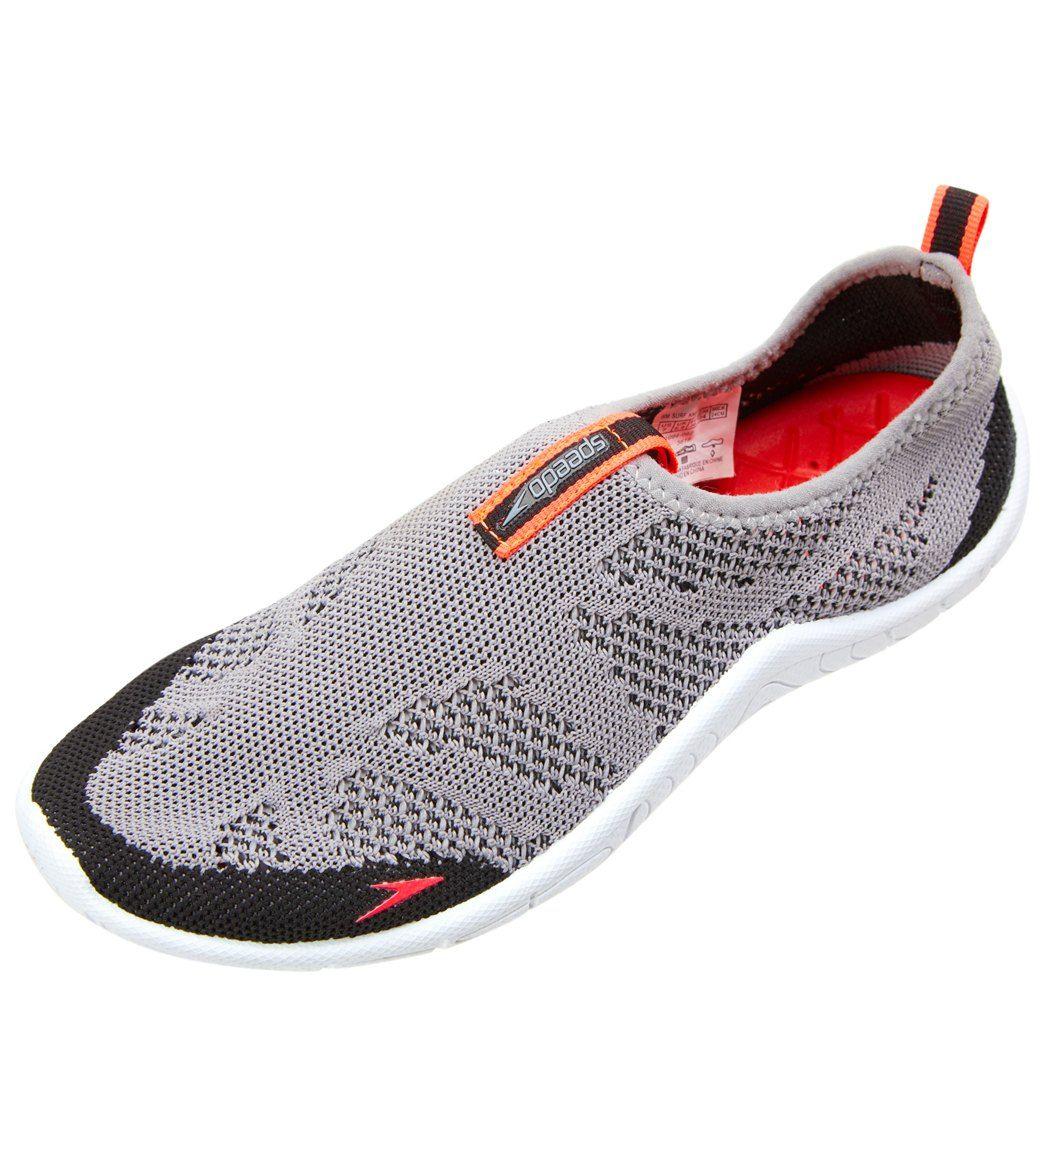 Speedo Women s Surf Knit Water Shoe at SwimOutlet.com – The Web s most  popular swim fe6caeb4577